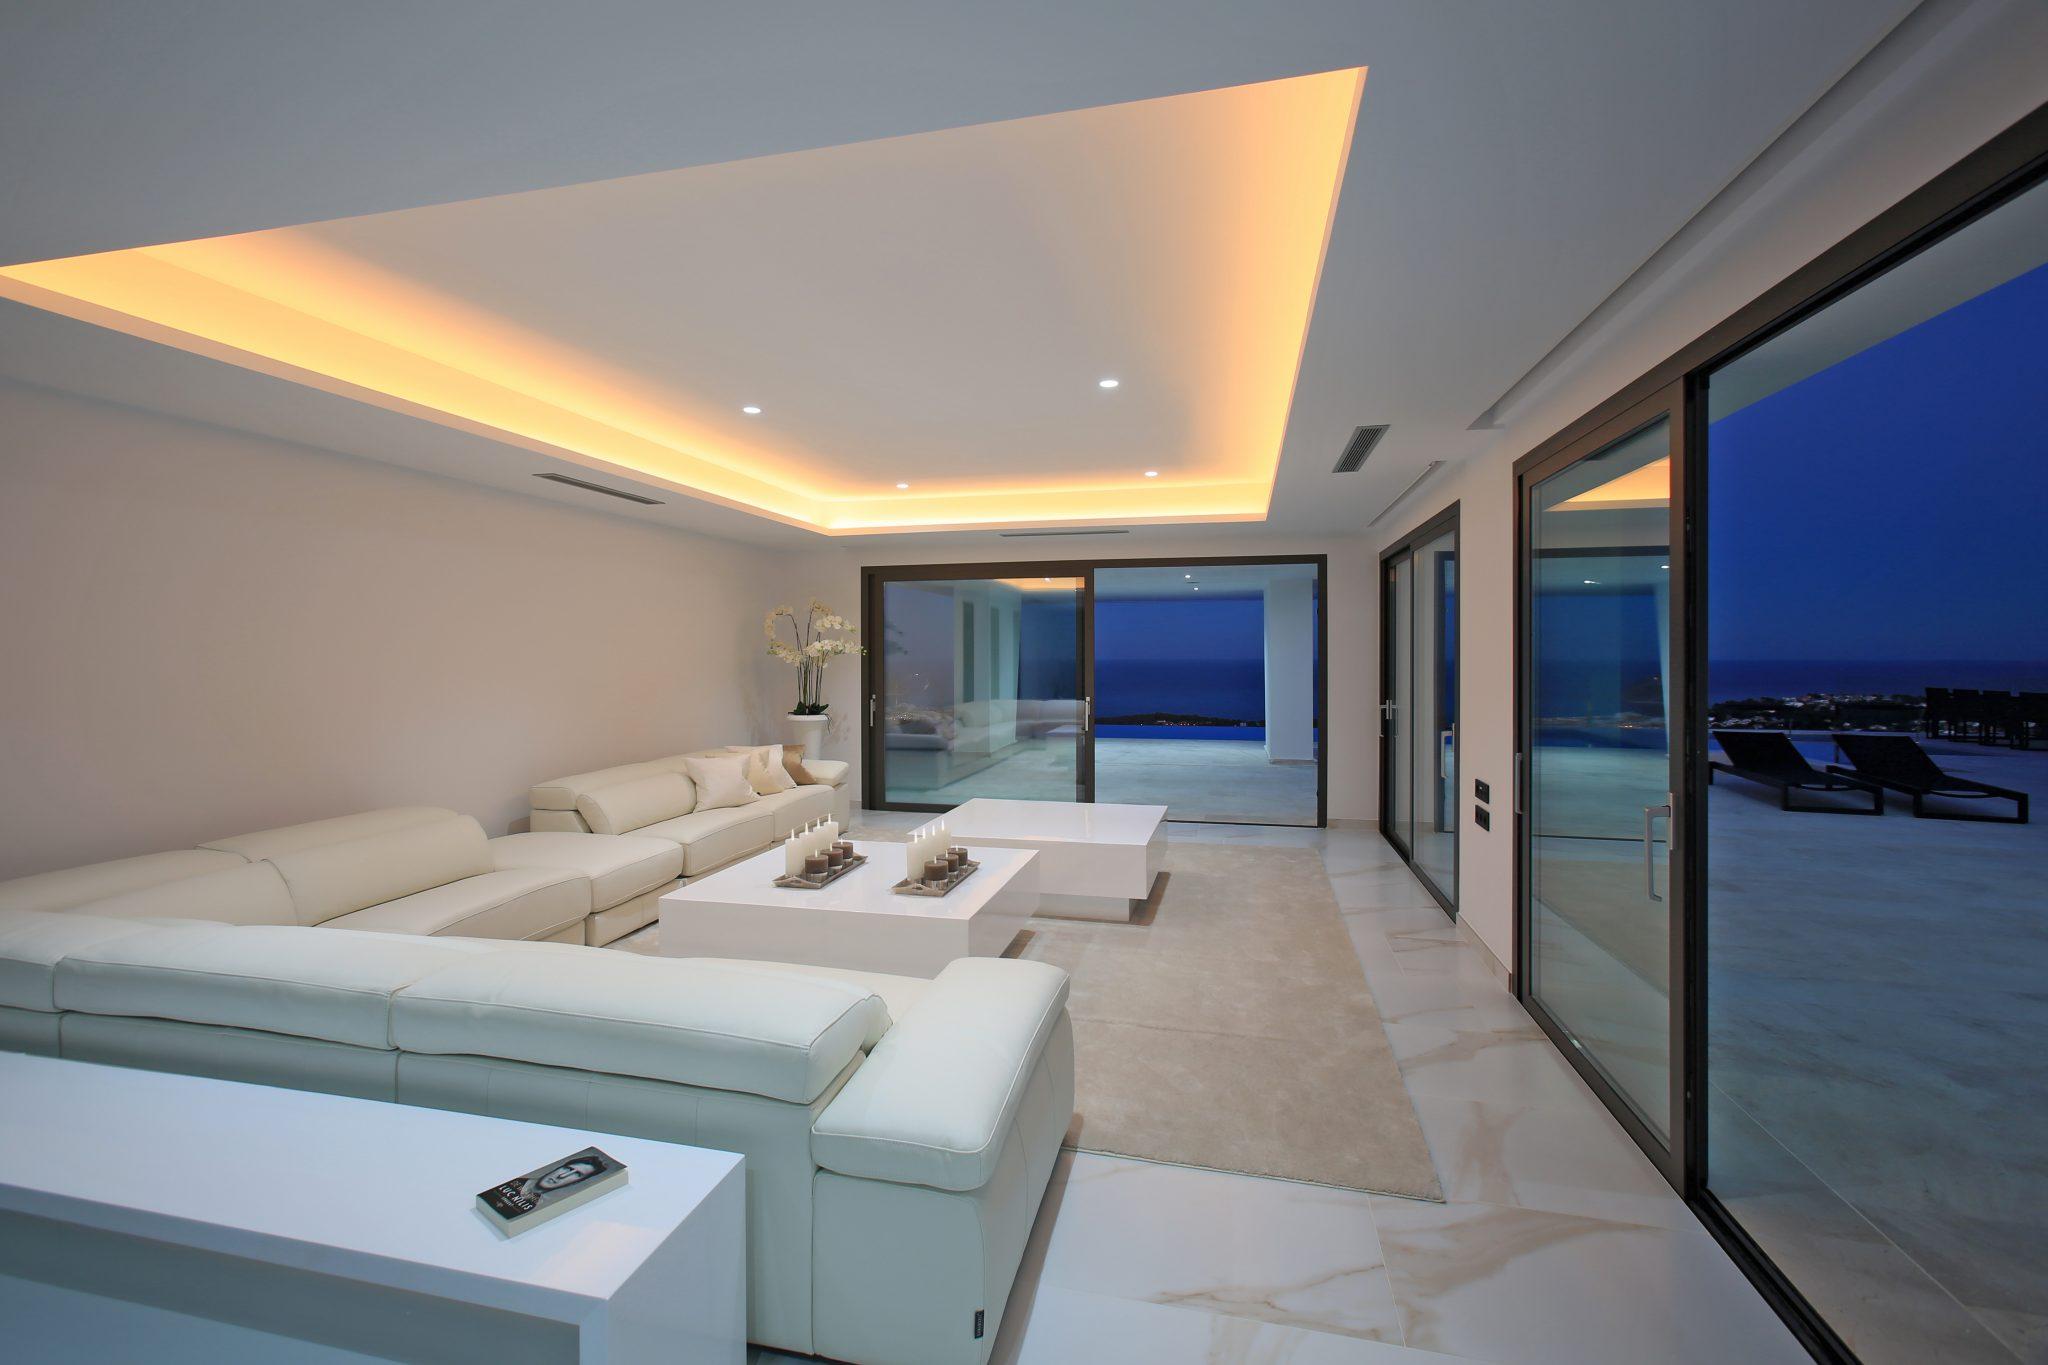 Tarraula interior design Javea